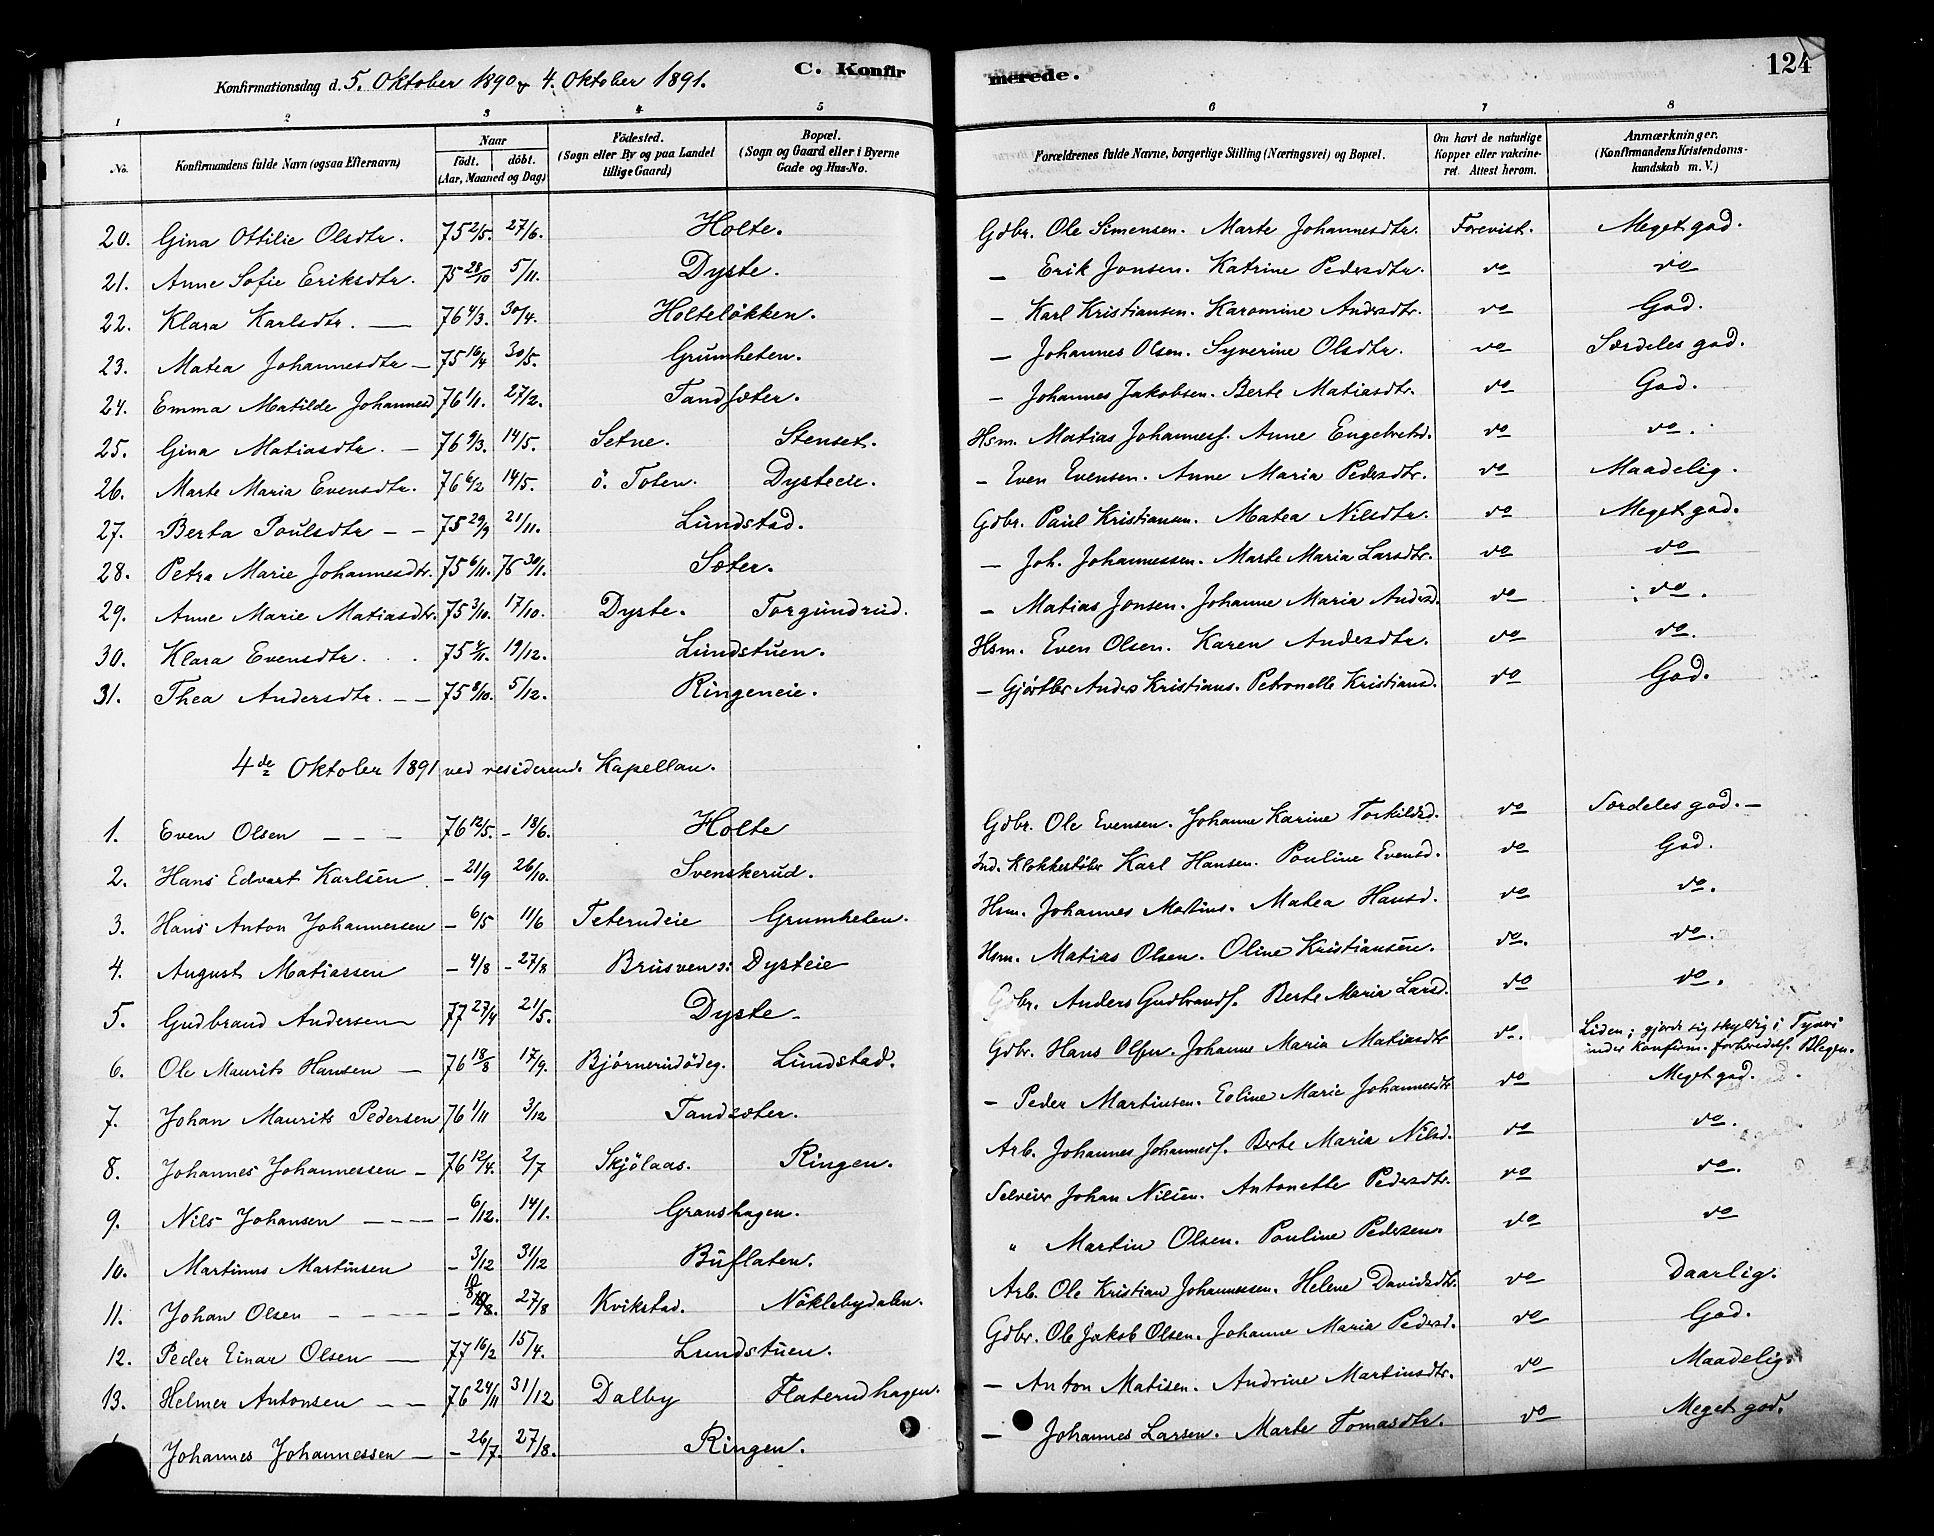 SAH, Vestre Toten prestekontor, H/Ha/Haa/L0010: Ministerialbok nr. 10, 1878-1894, s. 124